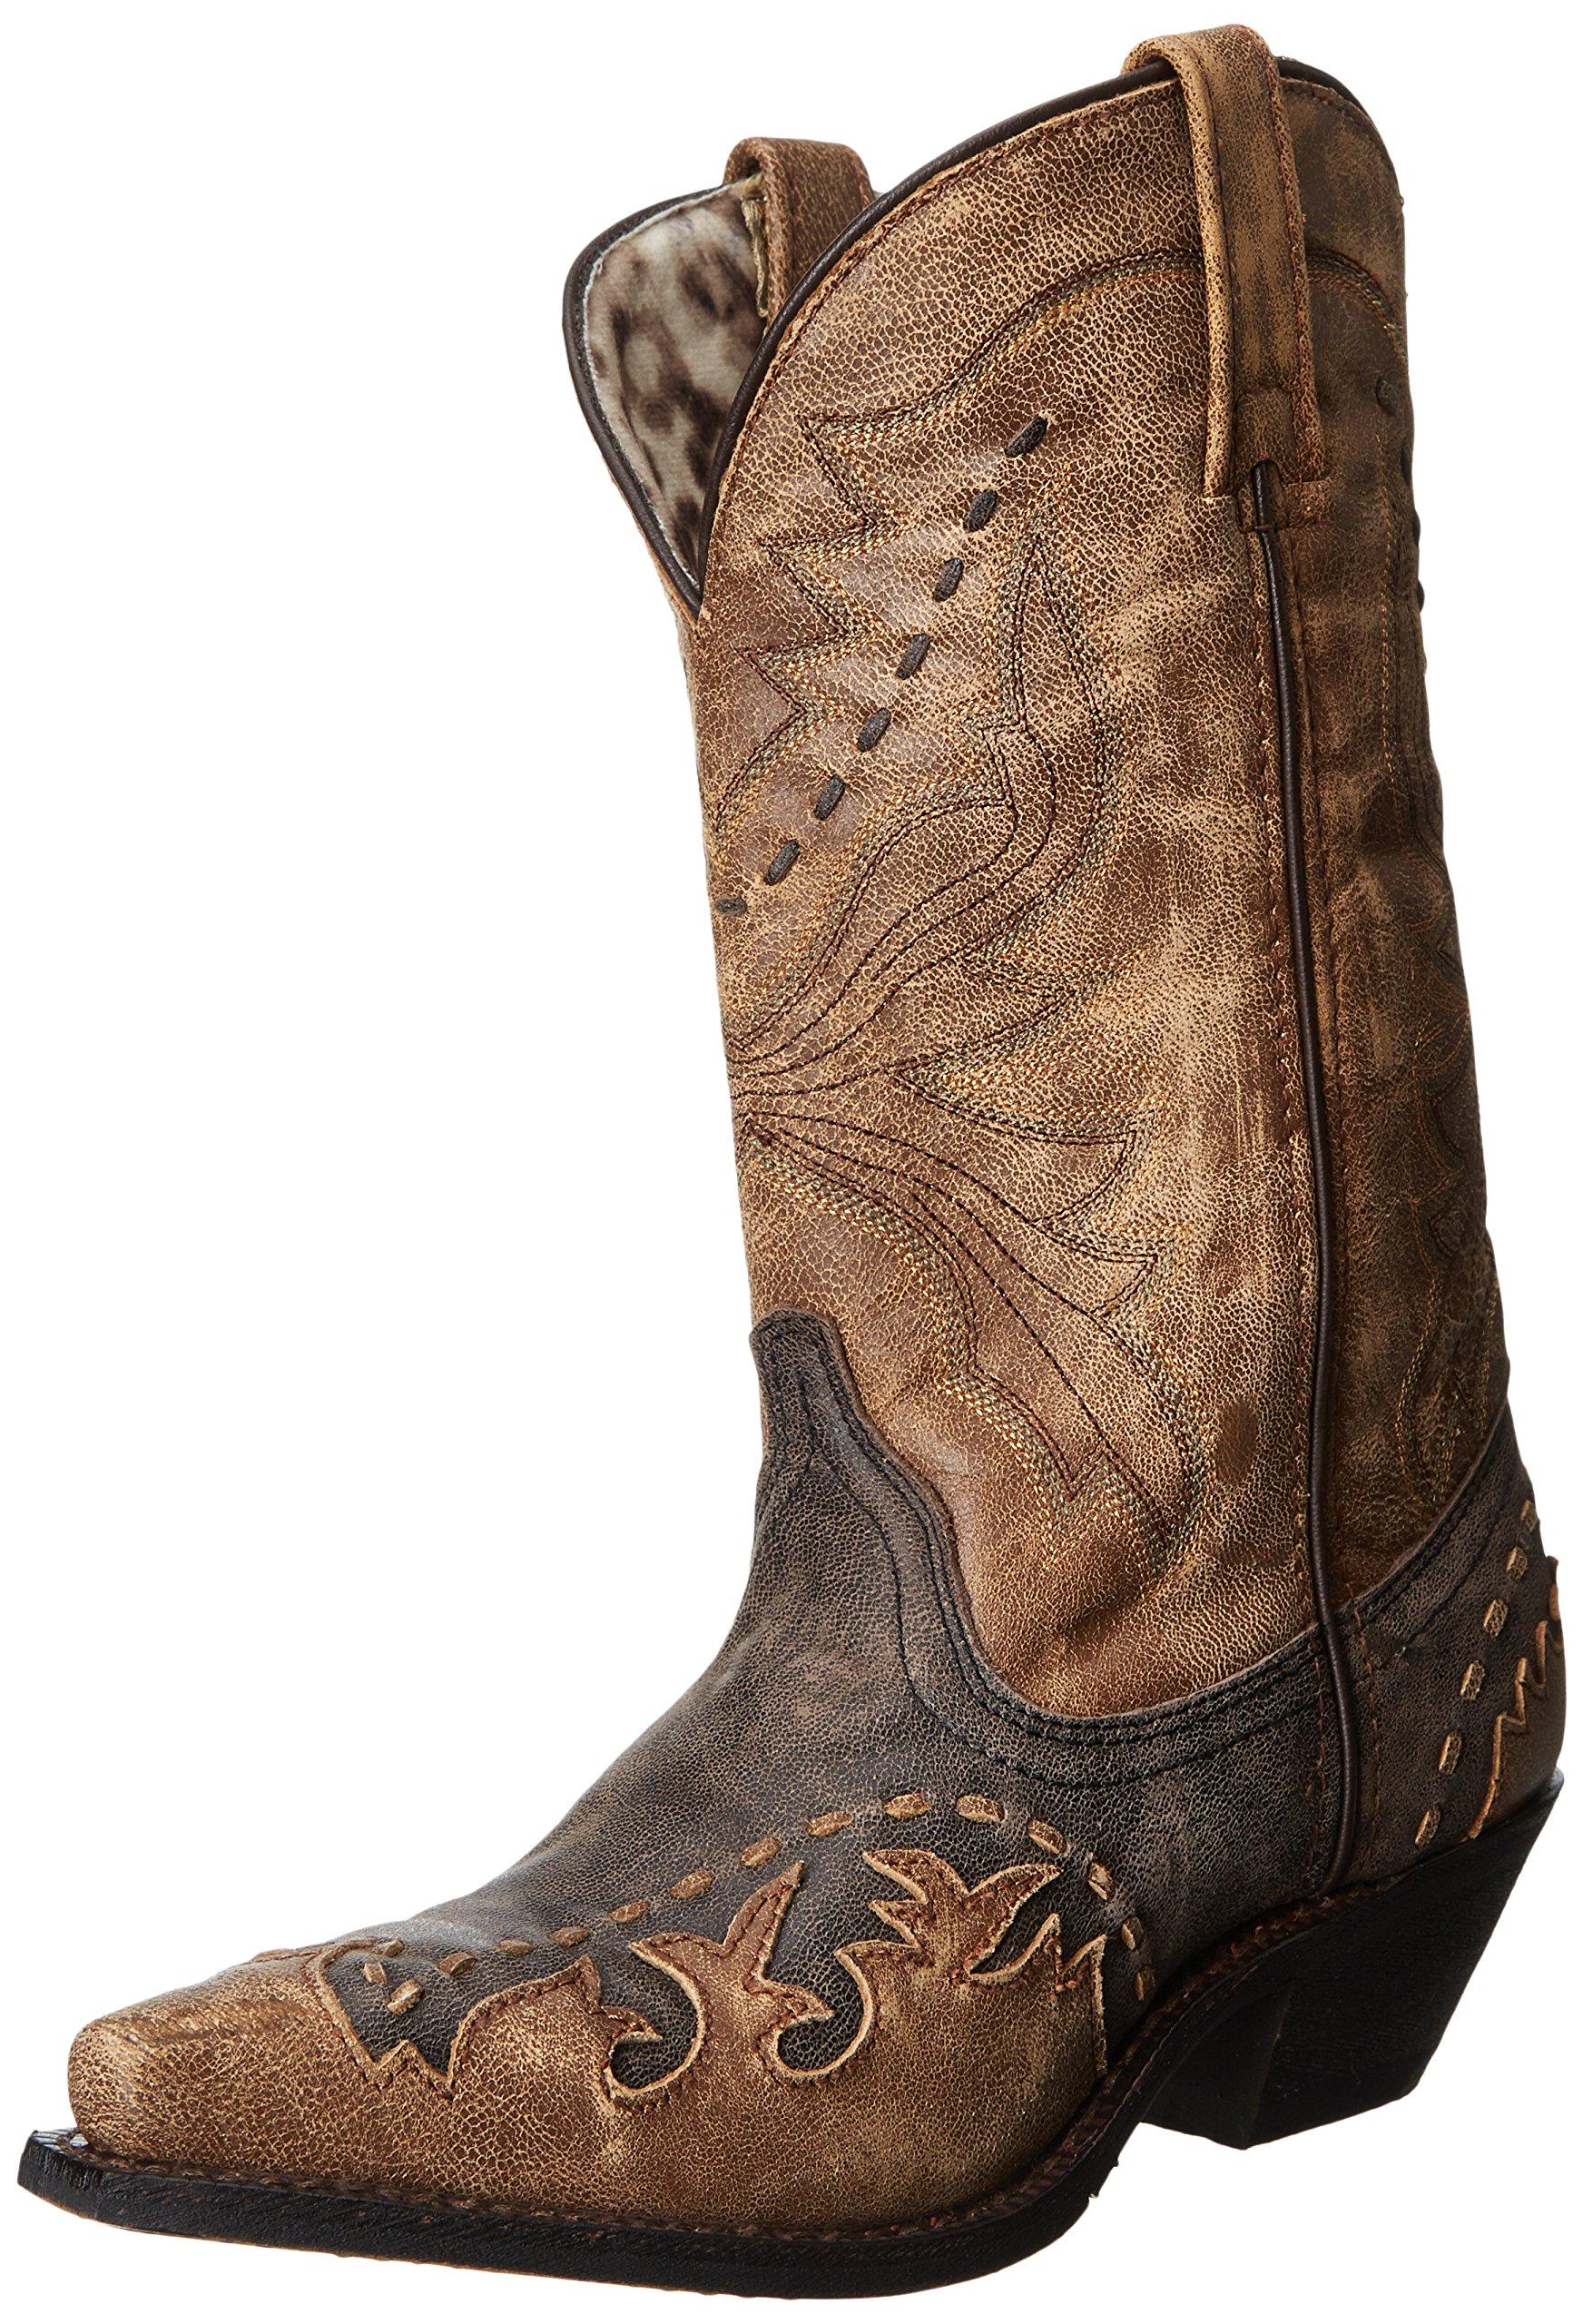 Laredo Women's Cullison Western Boot,Black/Tan,10 M US